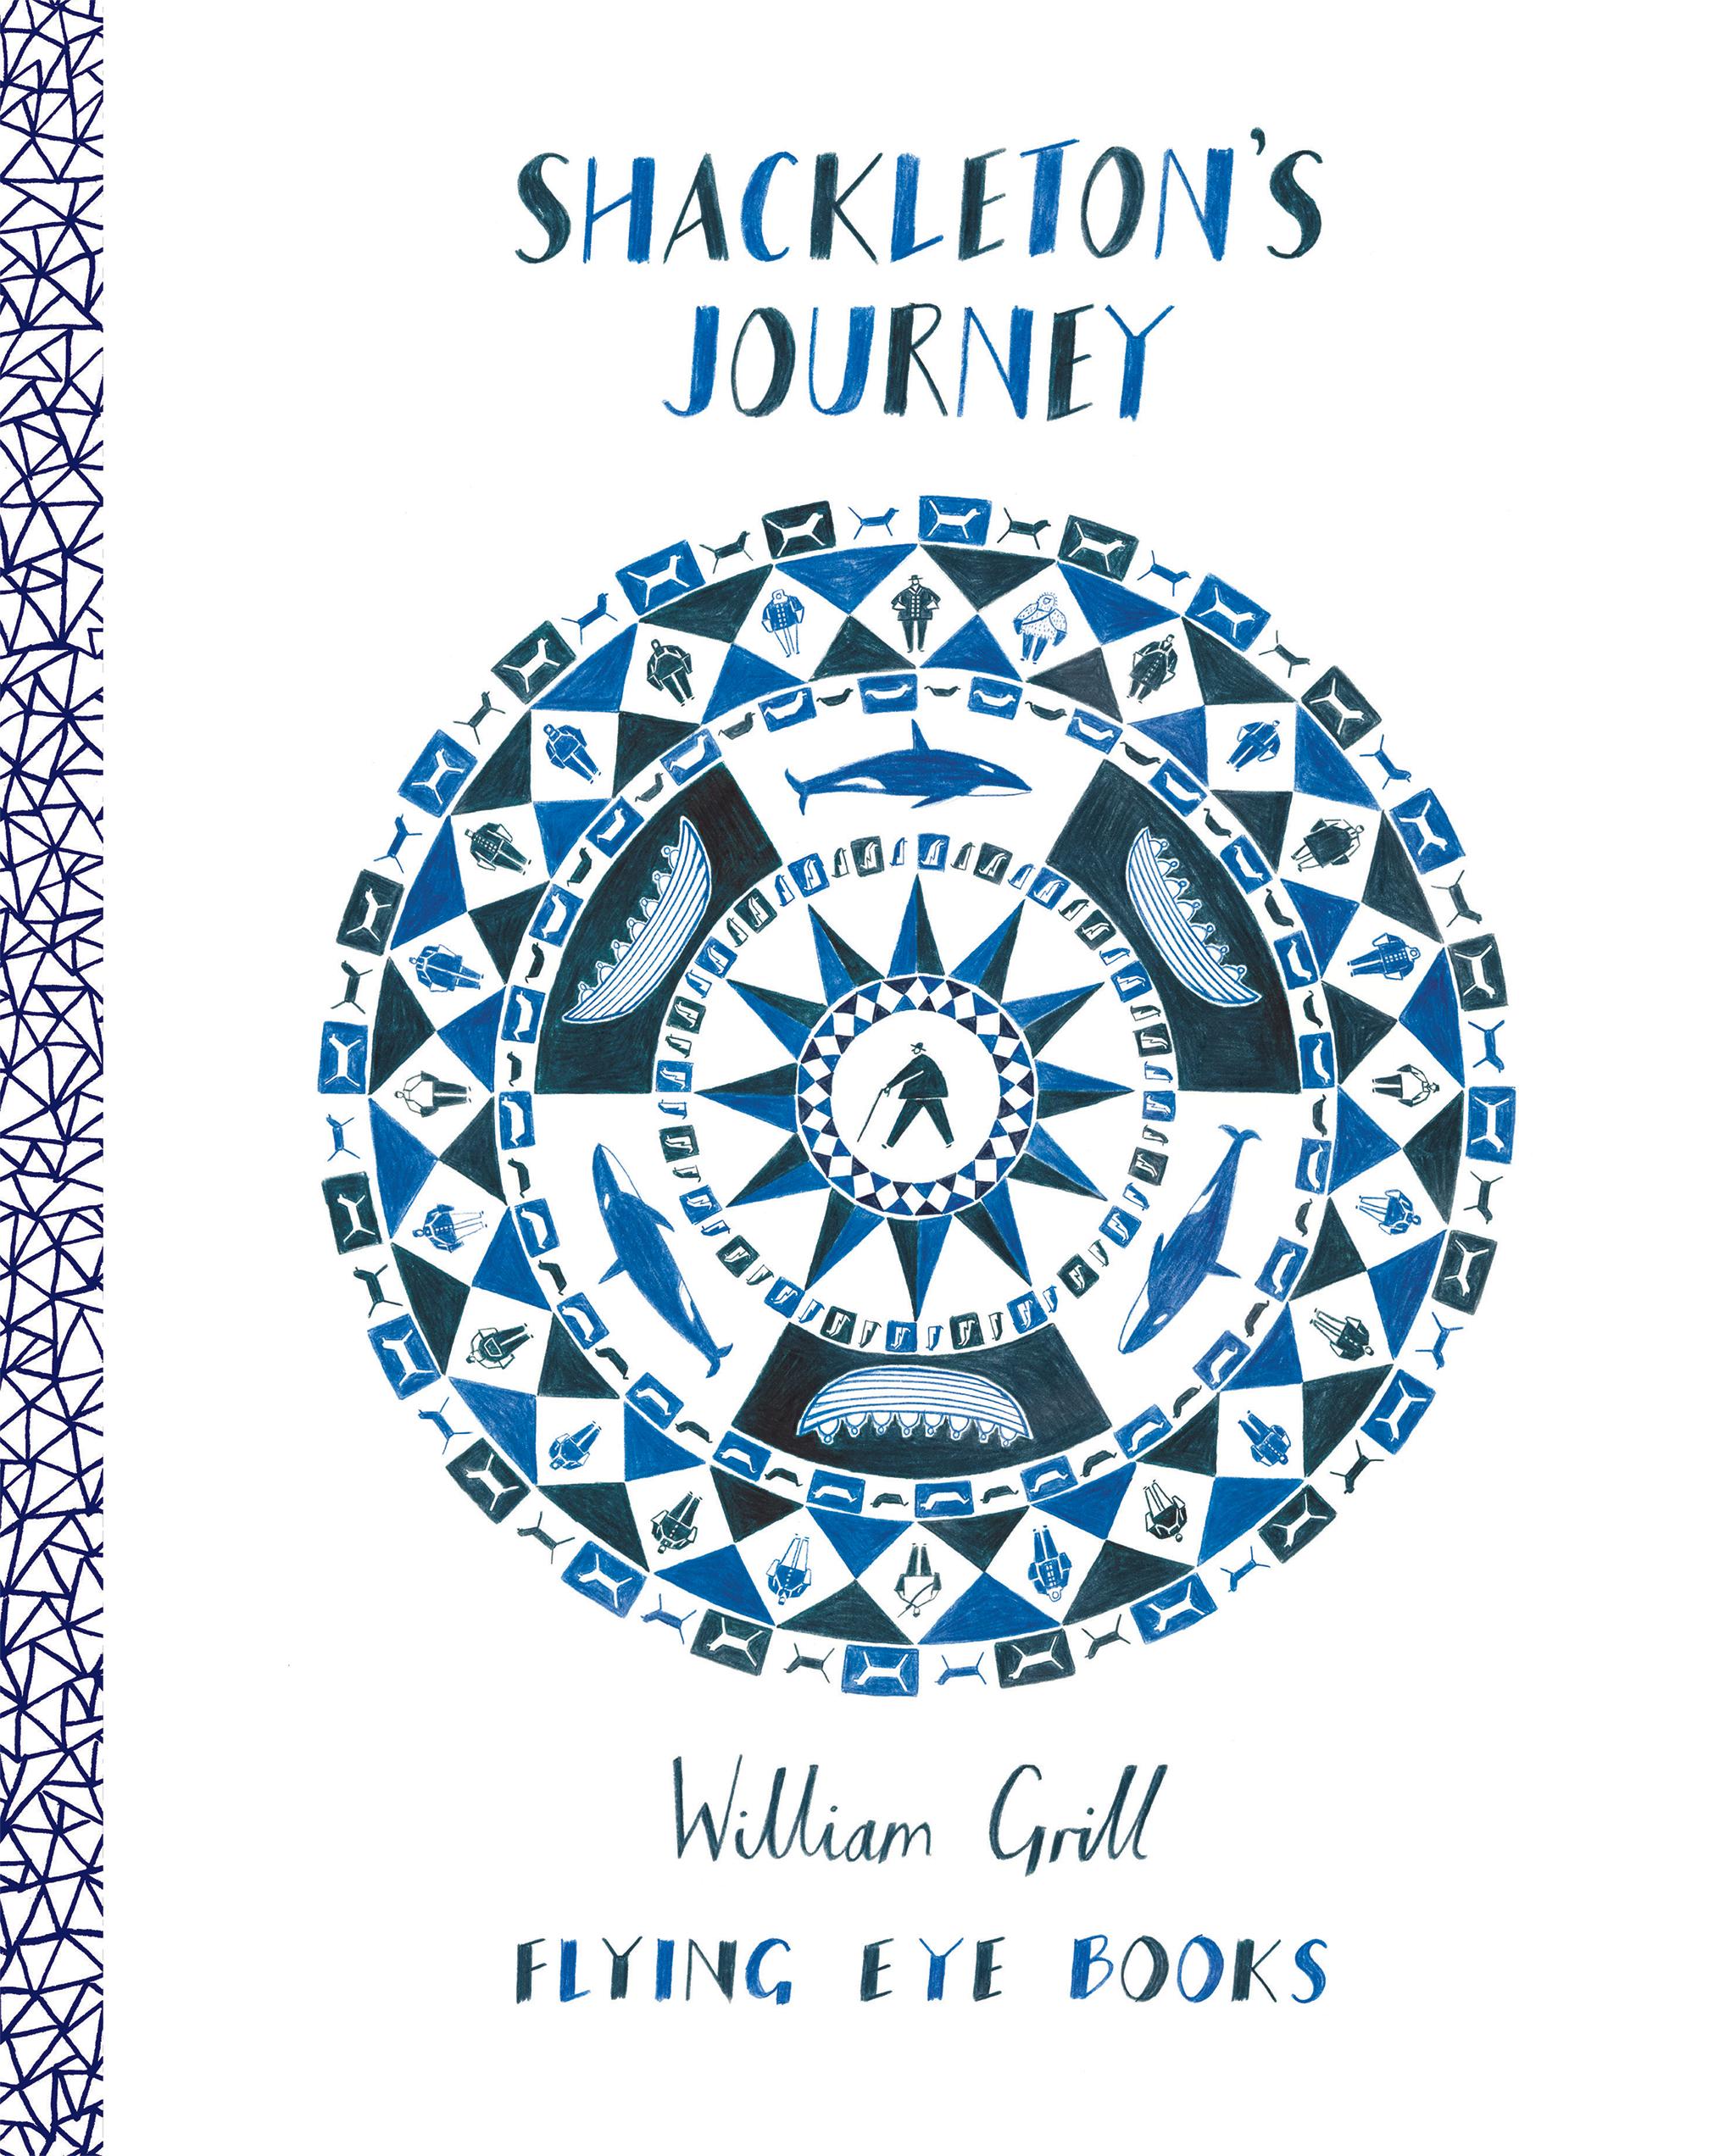 Shackleton's Journey – Flying Eye Books